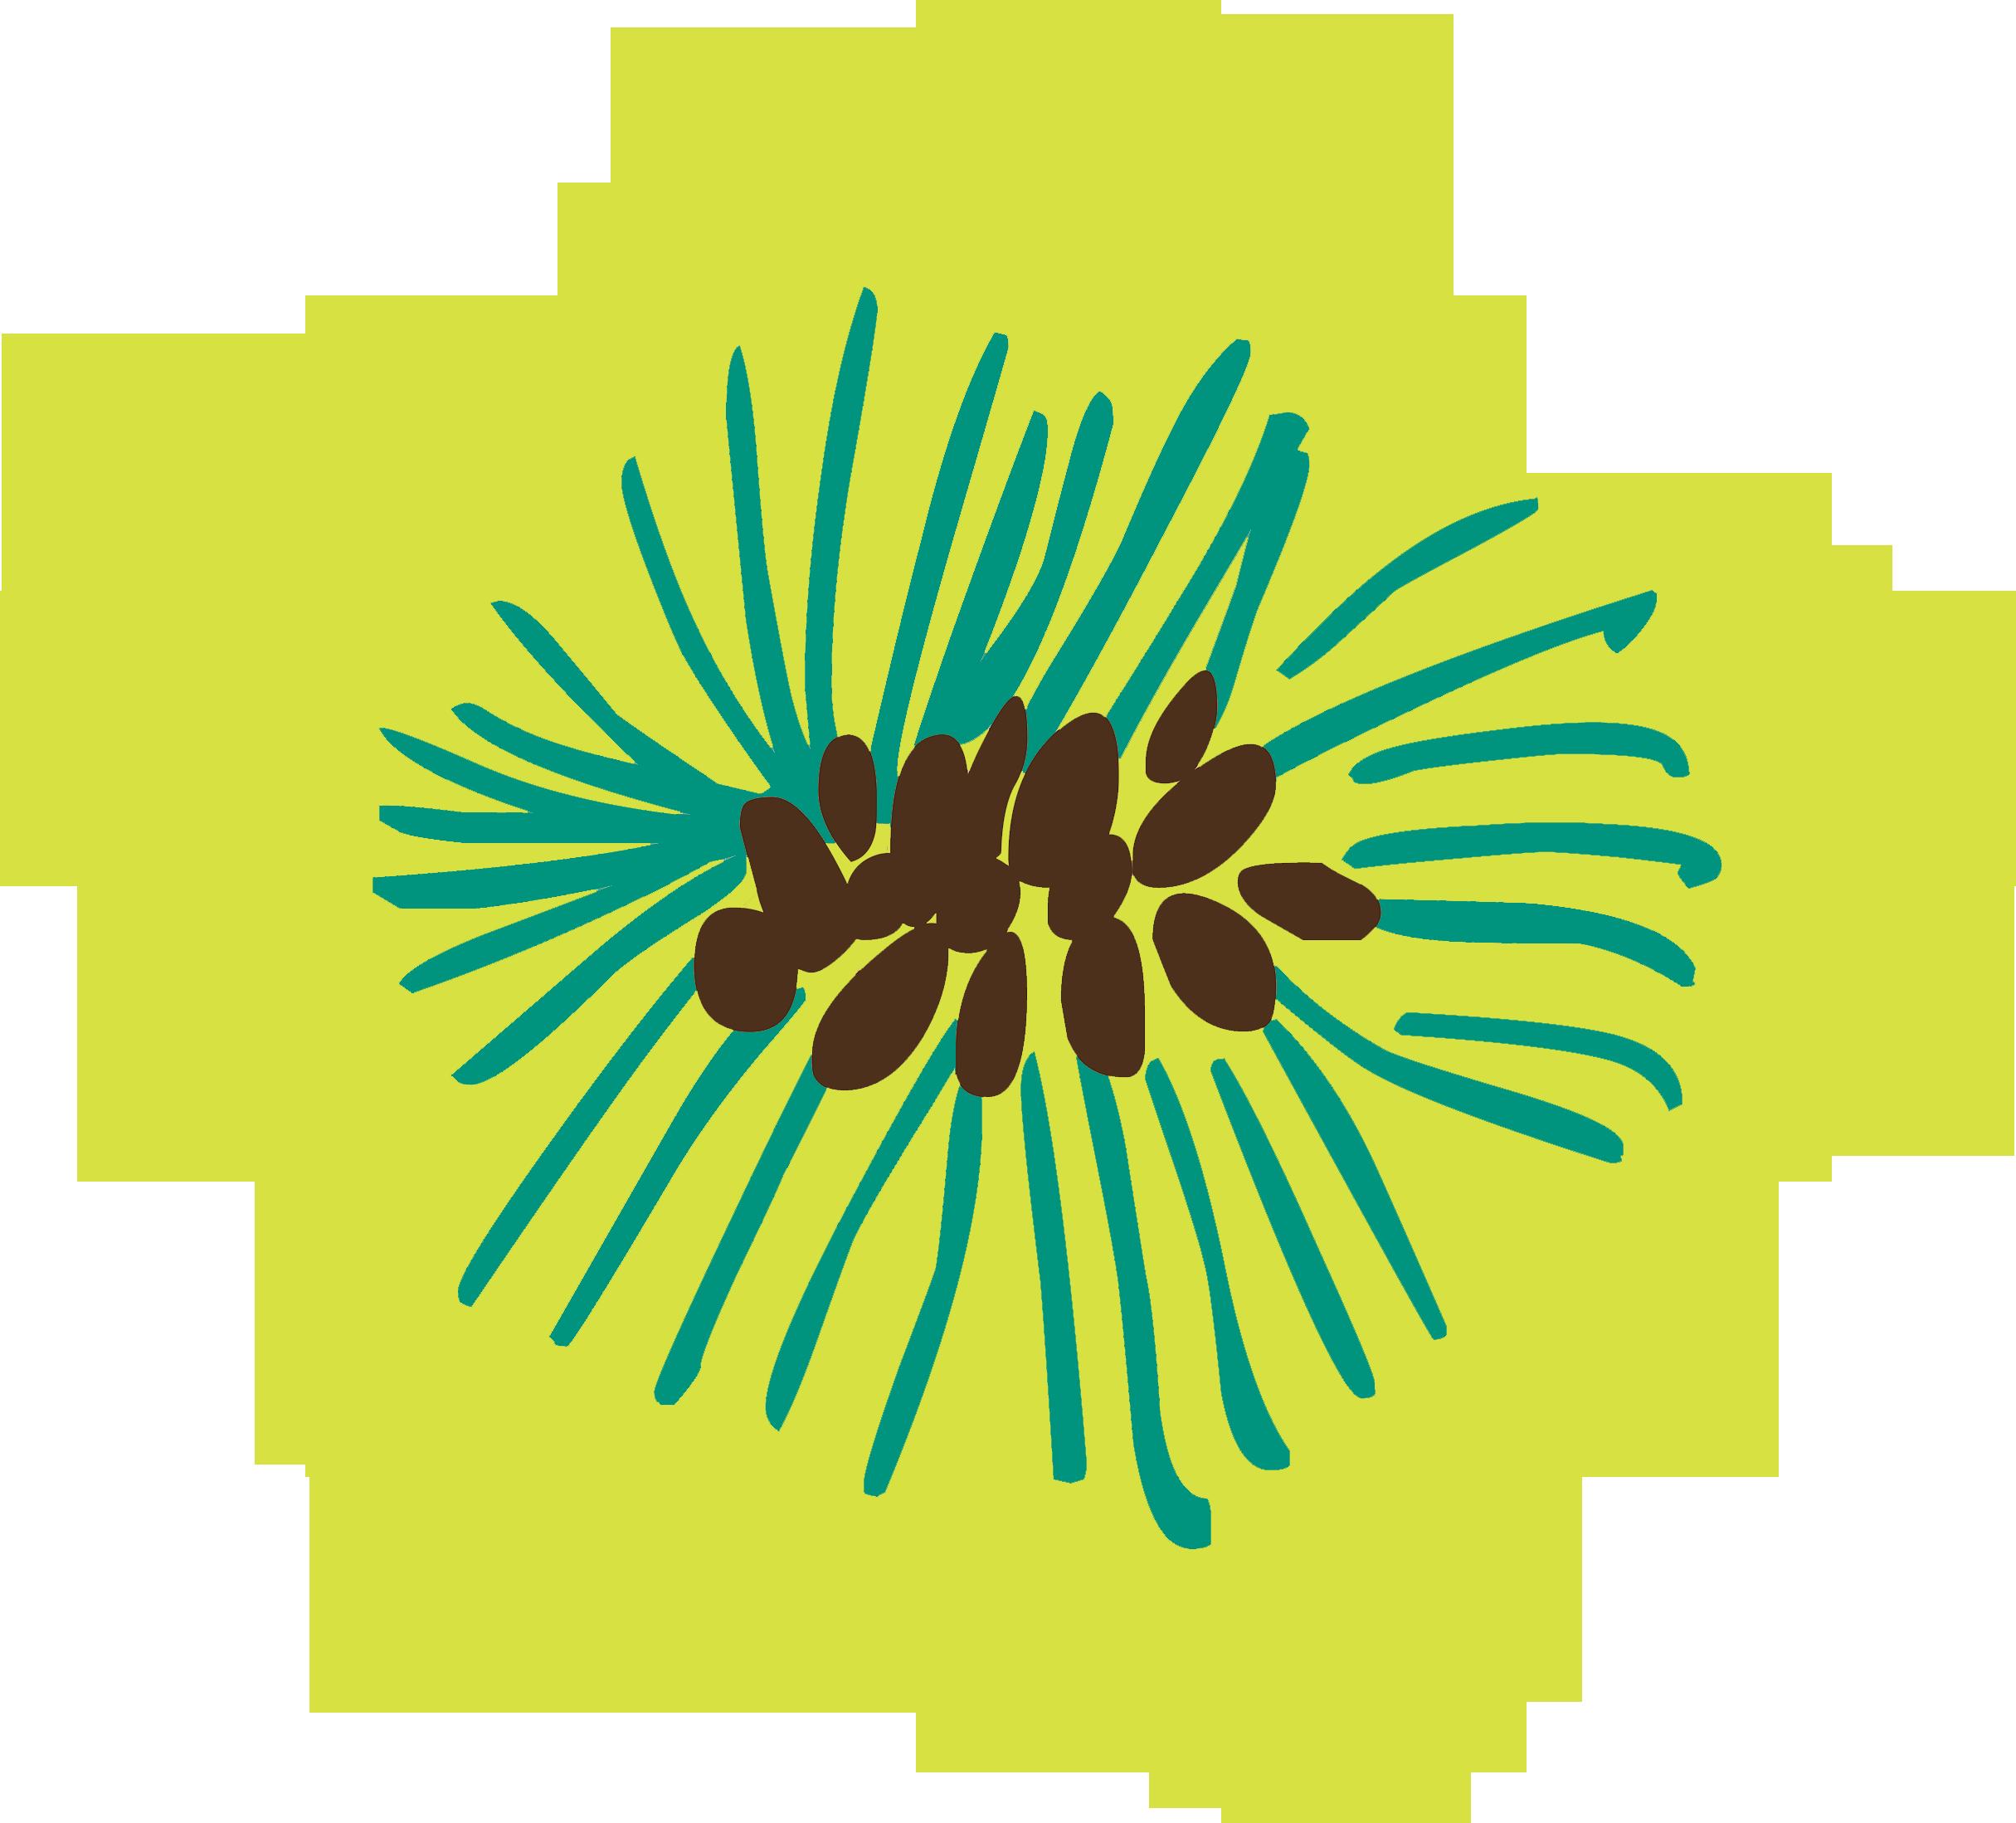 Petite-Fleurs-8 copy